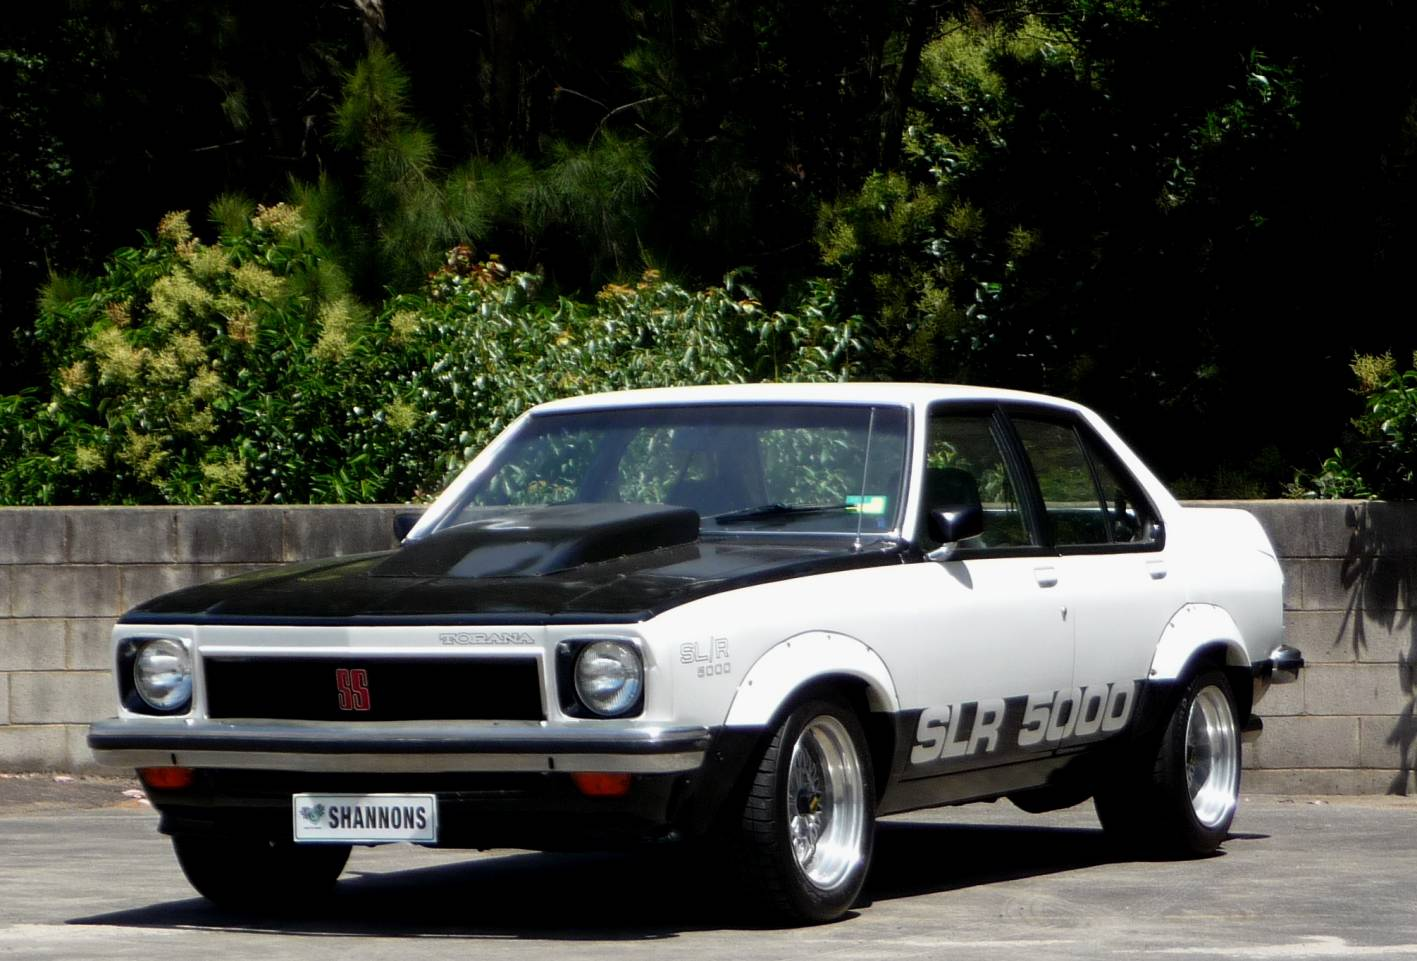 1978 Holden Lx Torana Slr 5000